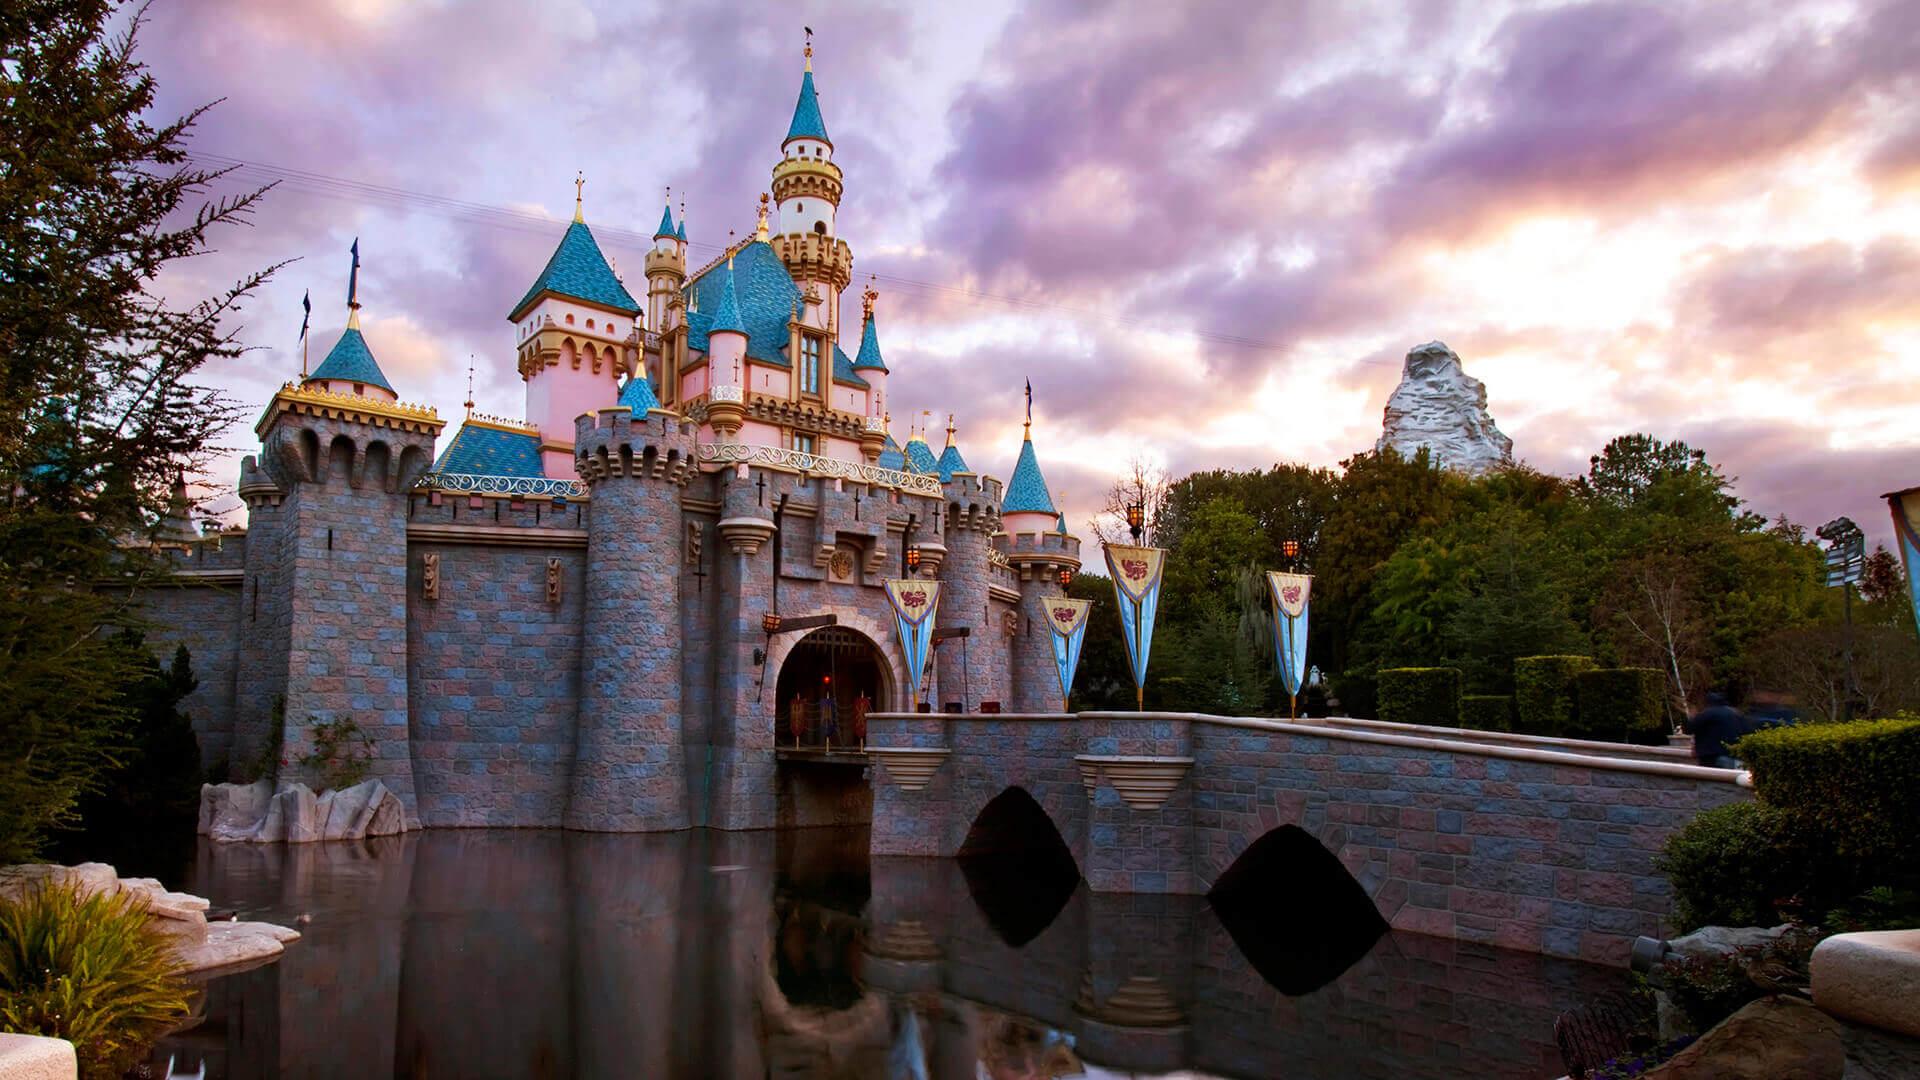 Destination: The World of Imagination